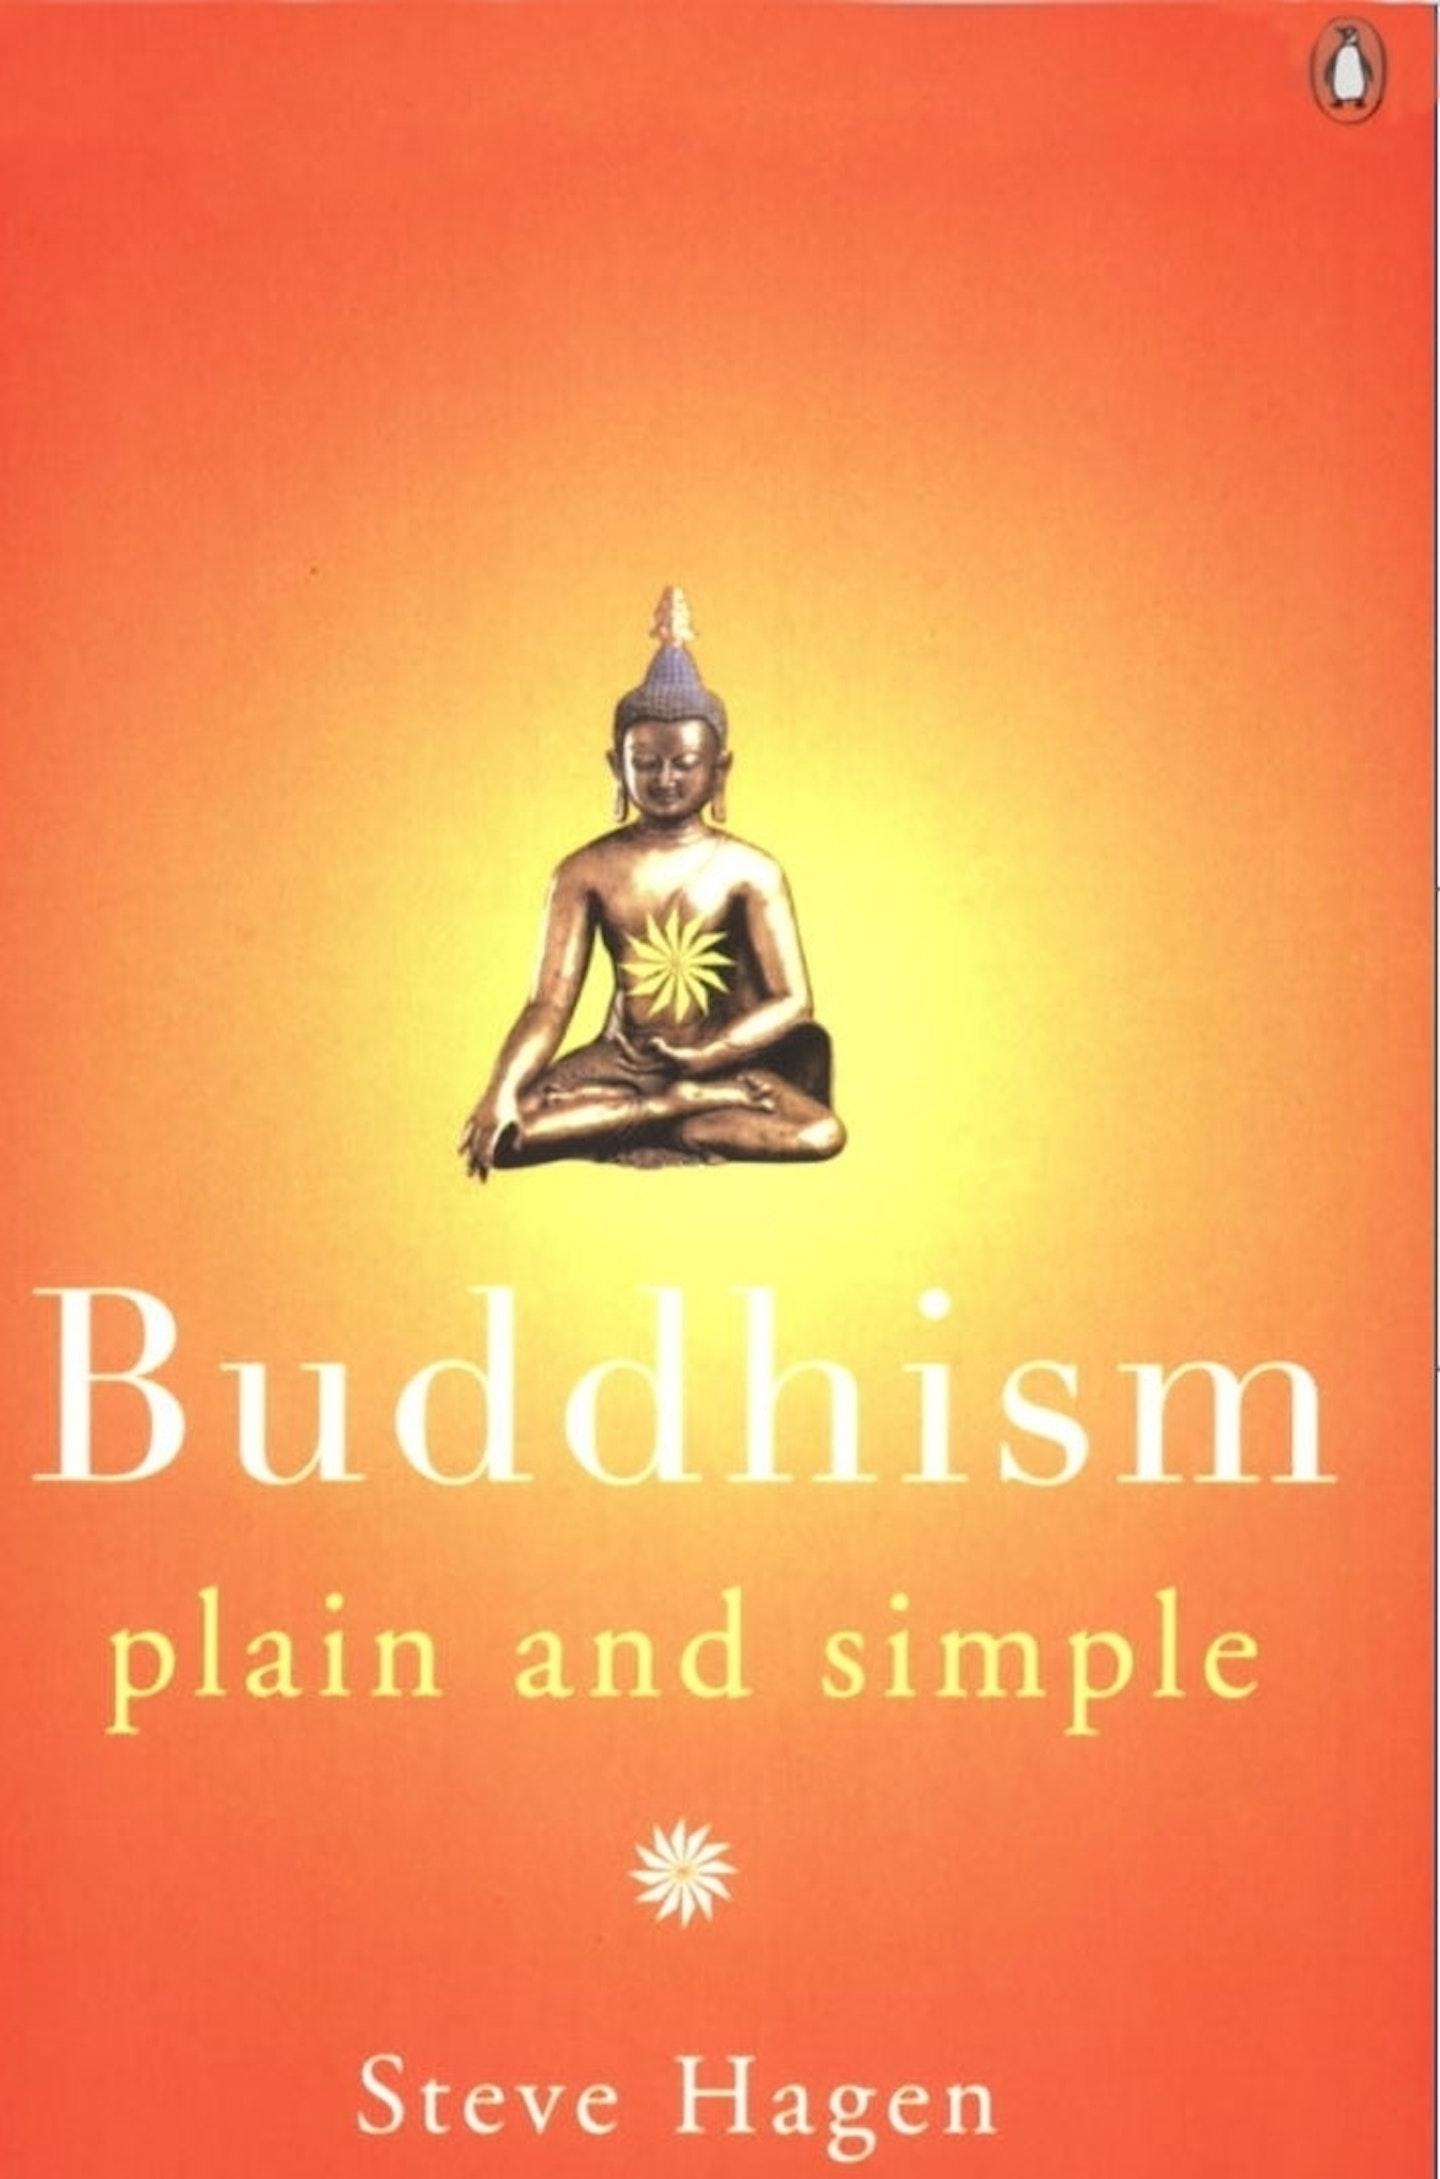 Simple Book Cover : Buddhism plain and simple penguin books australia